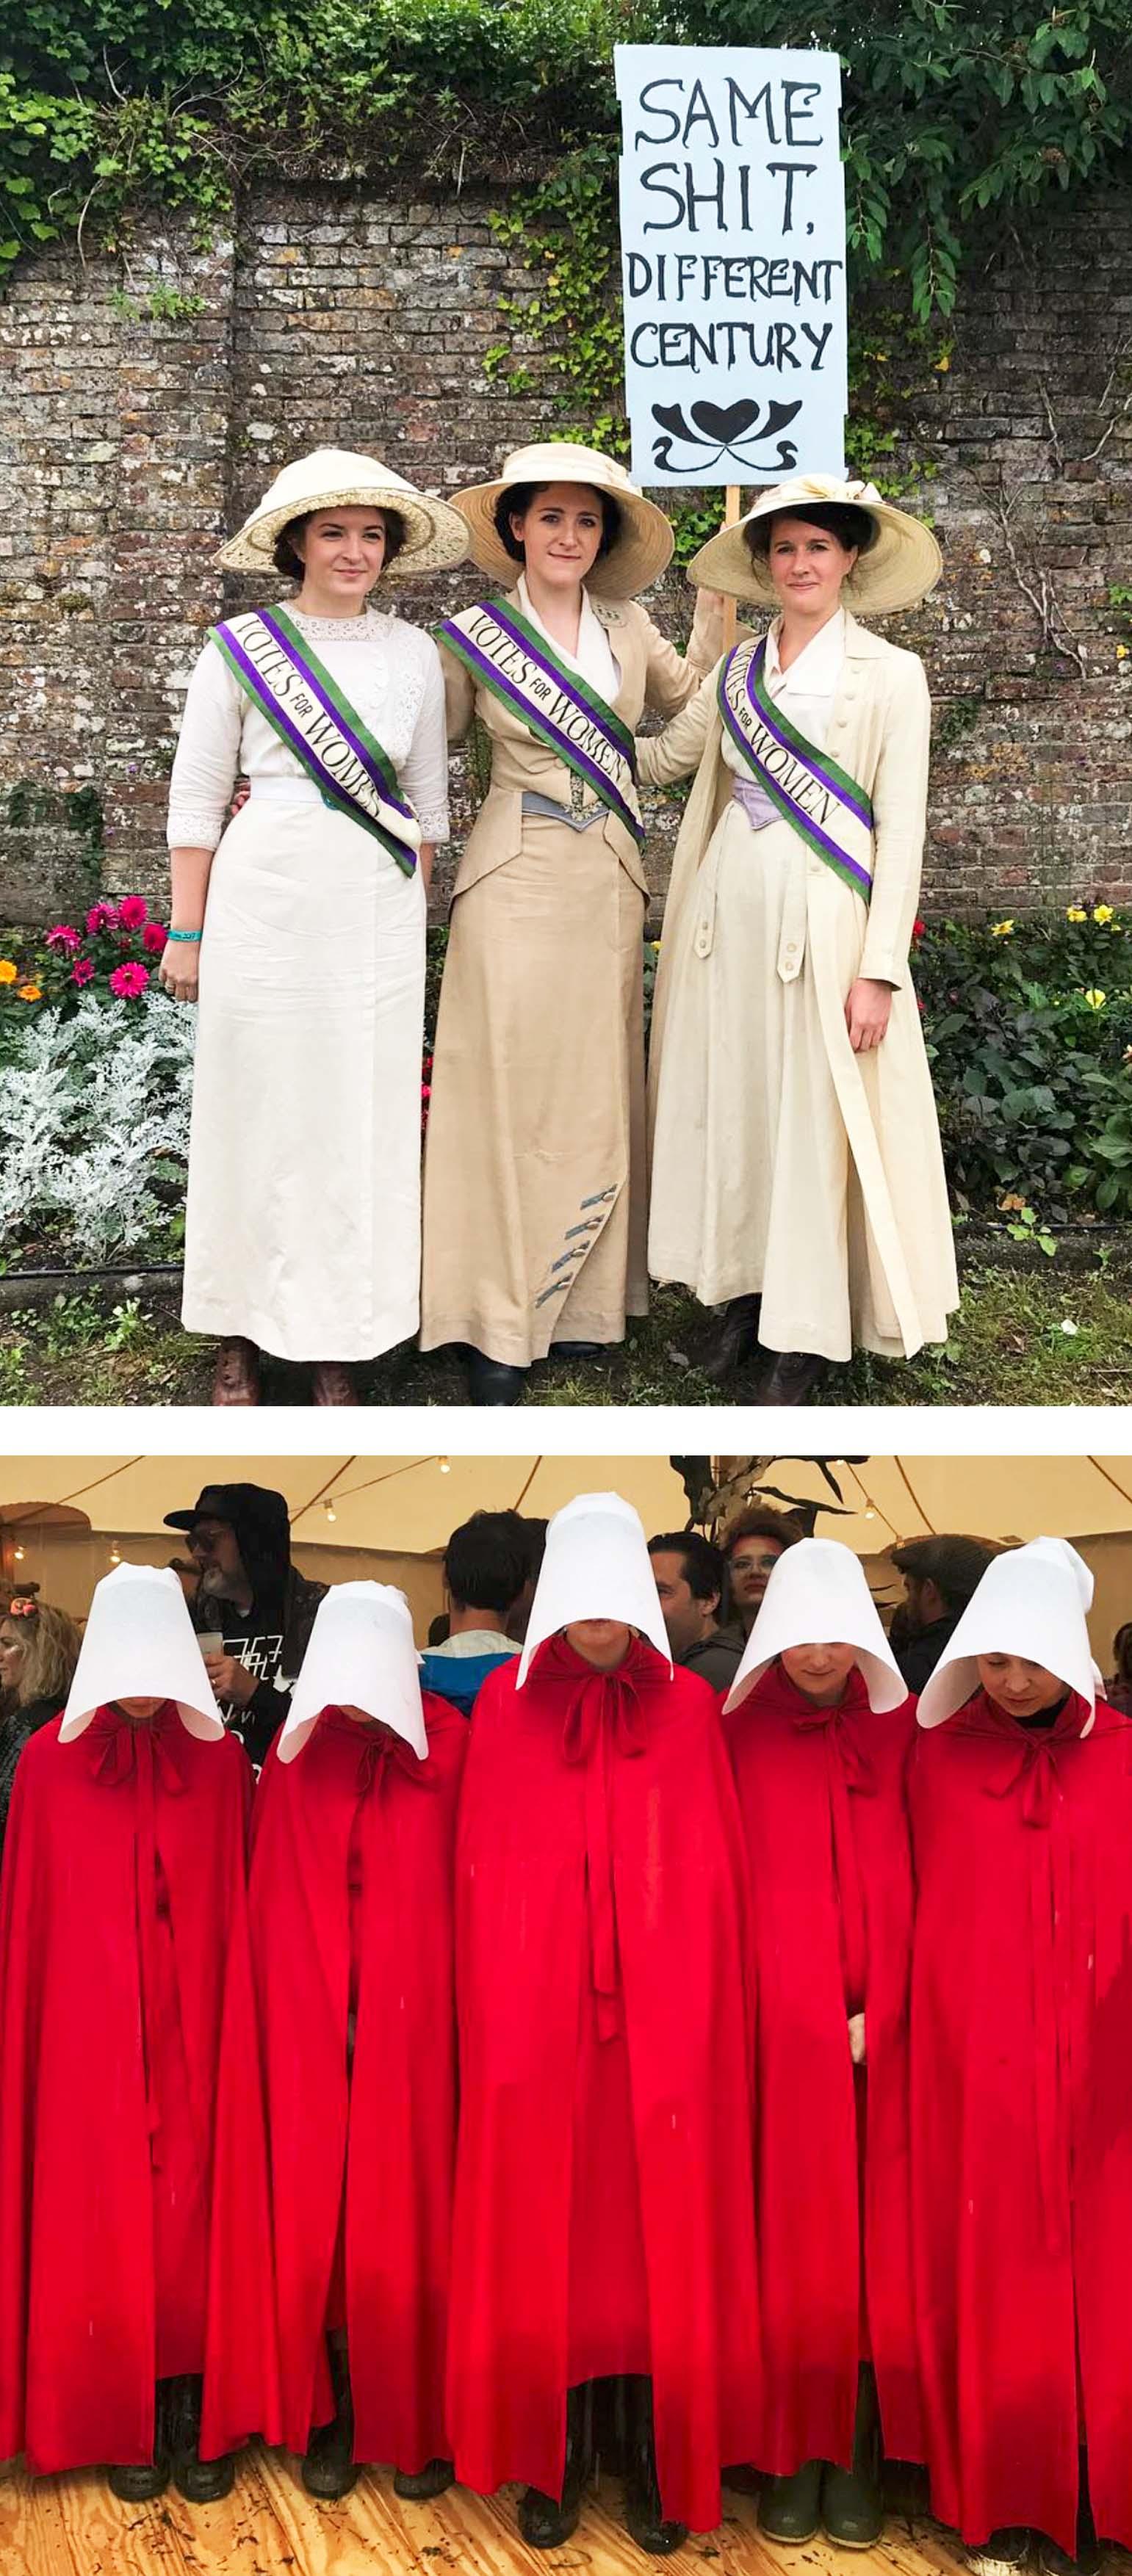 port Eliot festival 2017 - protest fashion